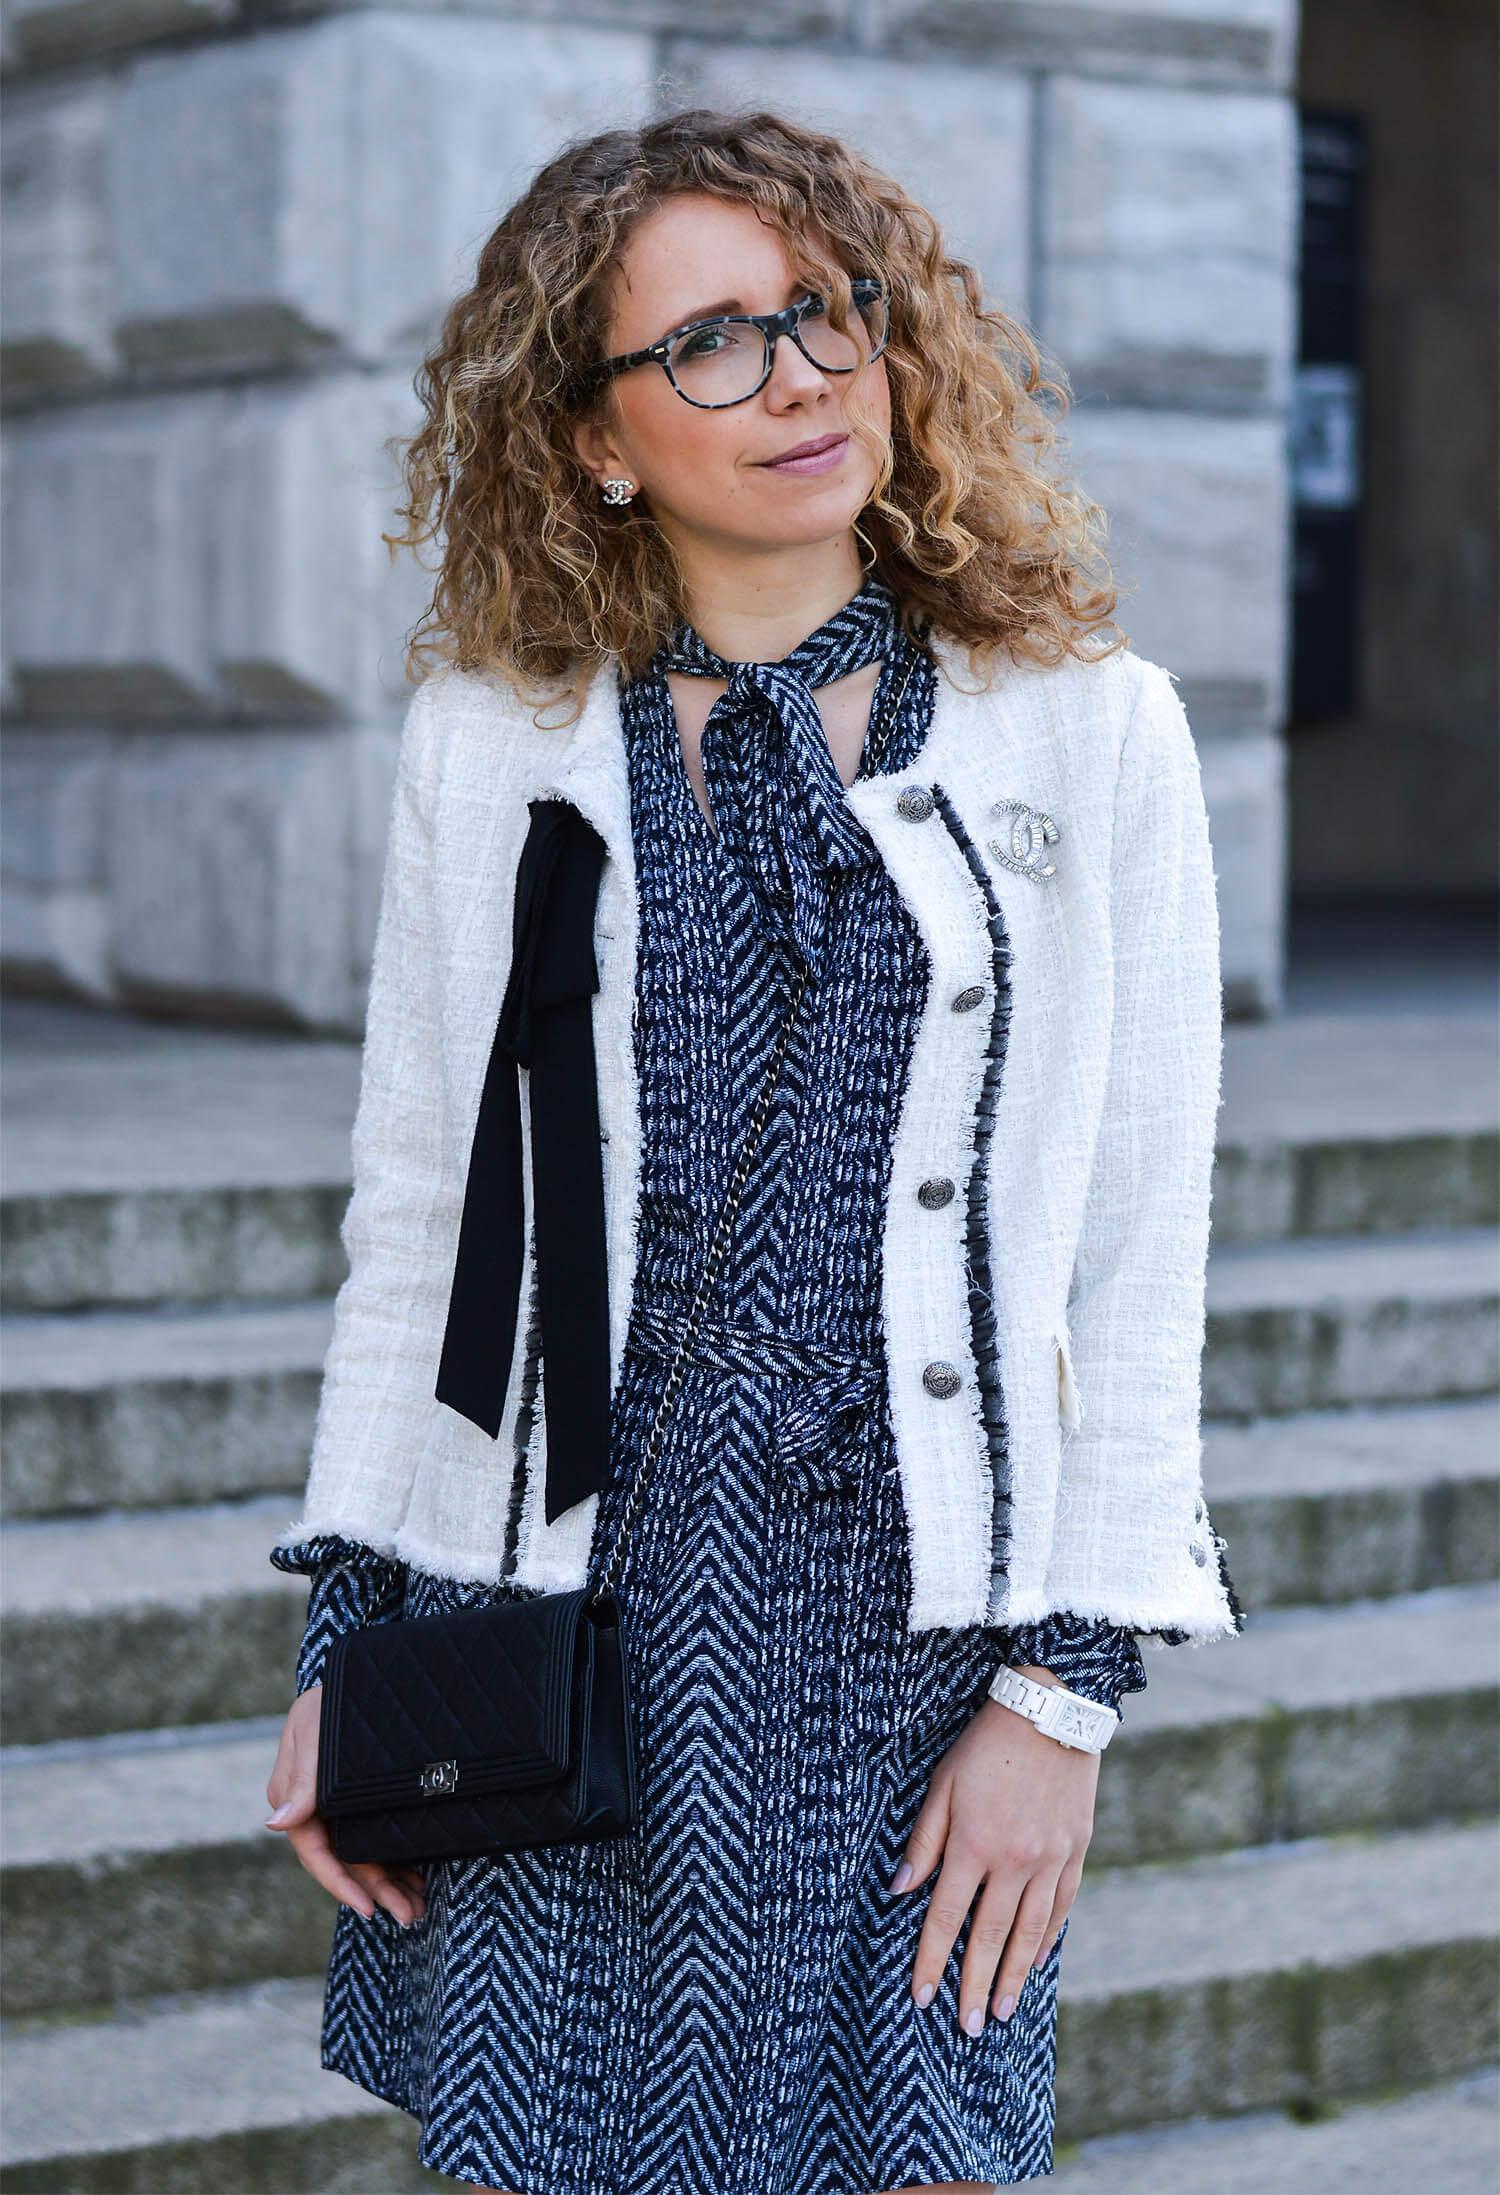 Kationette-fashionblog-nrw-Outfit-Spring-Chanel-boy-woc-Zara-streetstyle